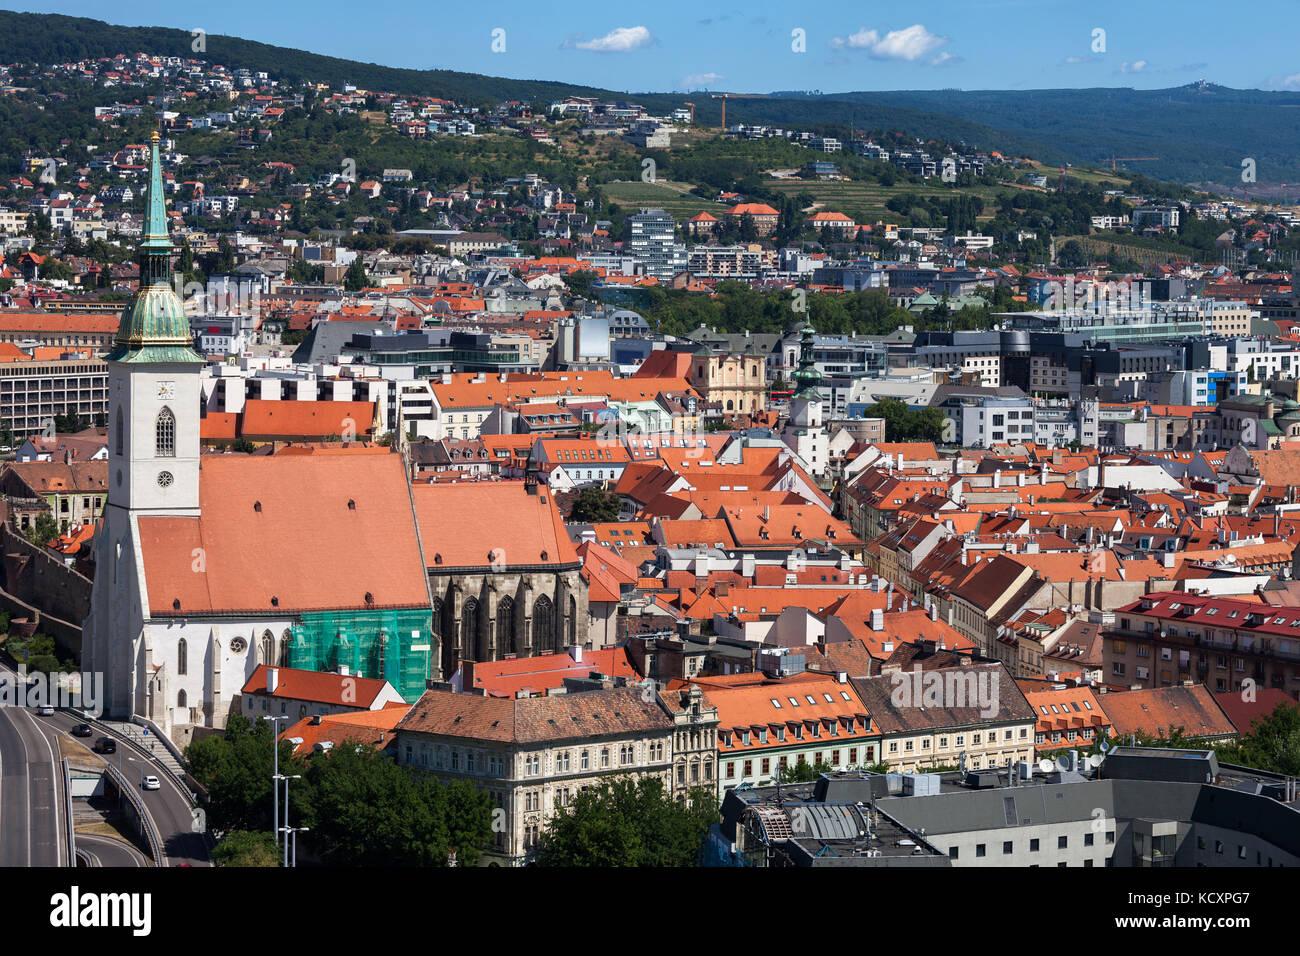 bratislava slovakia city roof stockfotos bratislava. Black Bedroom Furniture Sets. Home Design Ideas